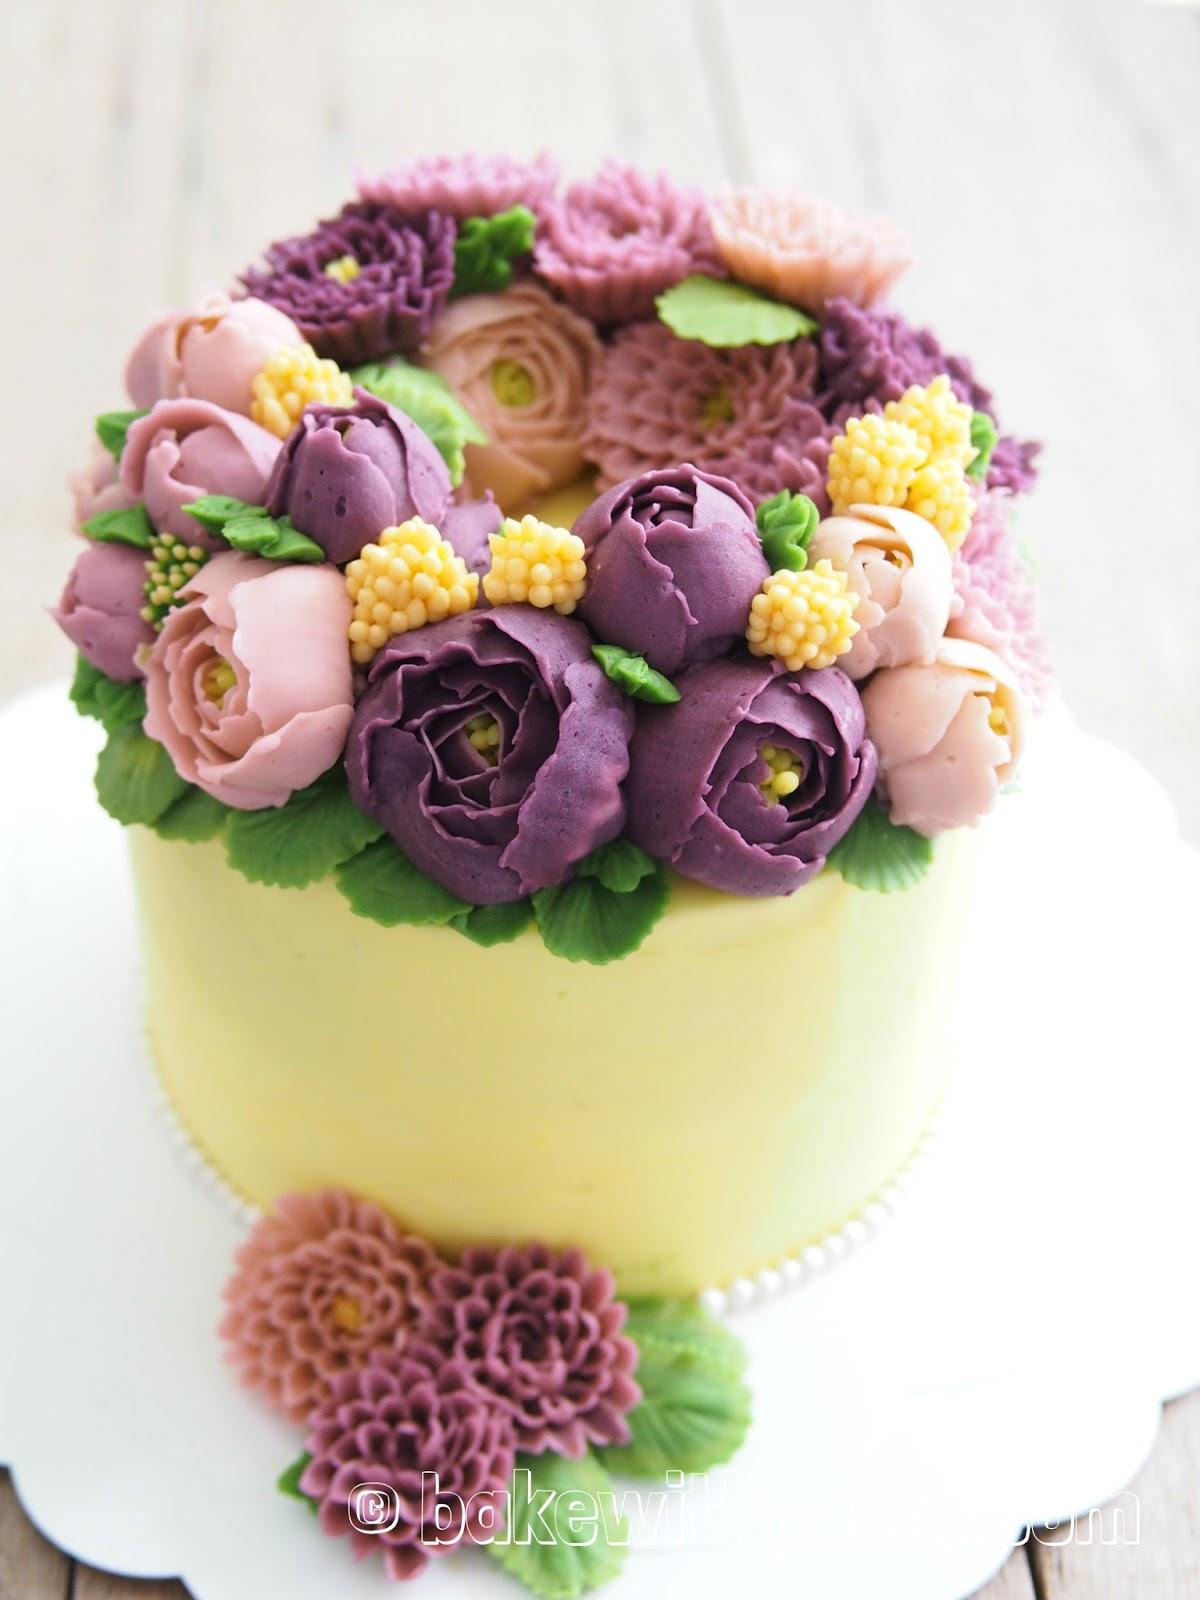 Korean Style Buttercream Flowers Cake - 9 - BAKE WITH PAWS